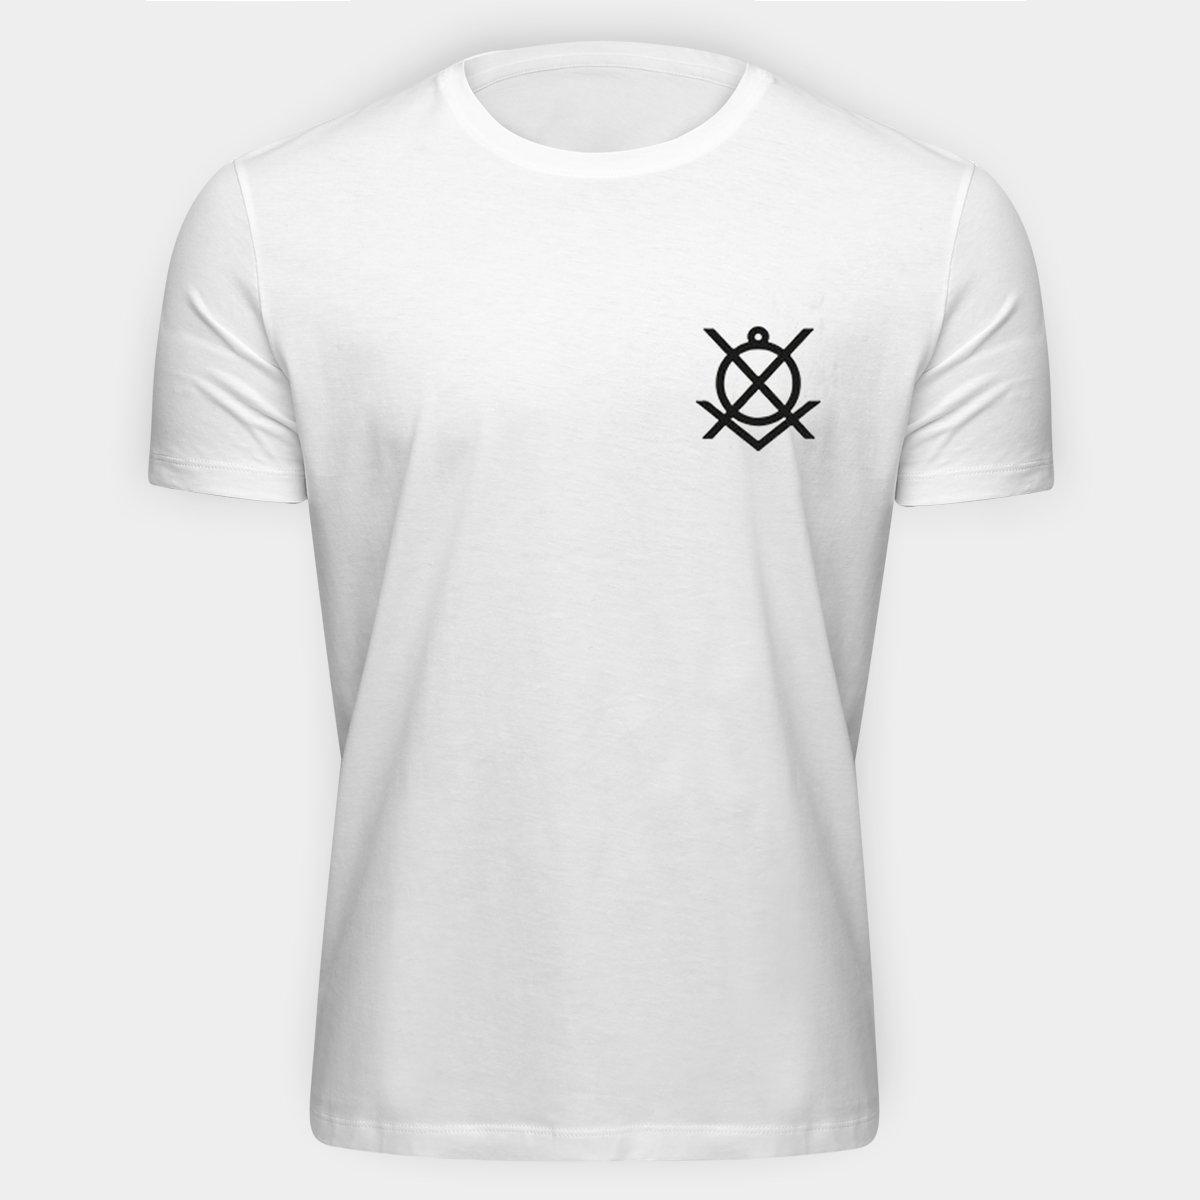 2e4285d35ed Camiseta Corinthians Corinthianismo Masculina - Branco - Compre ...